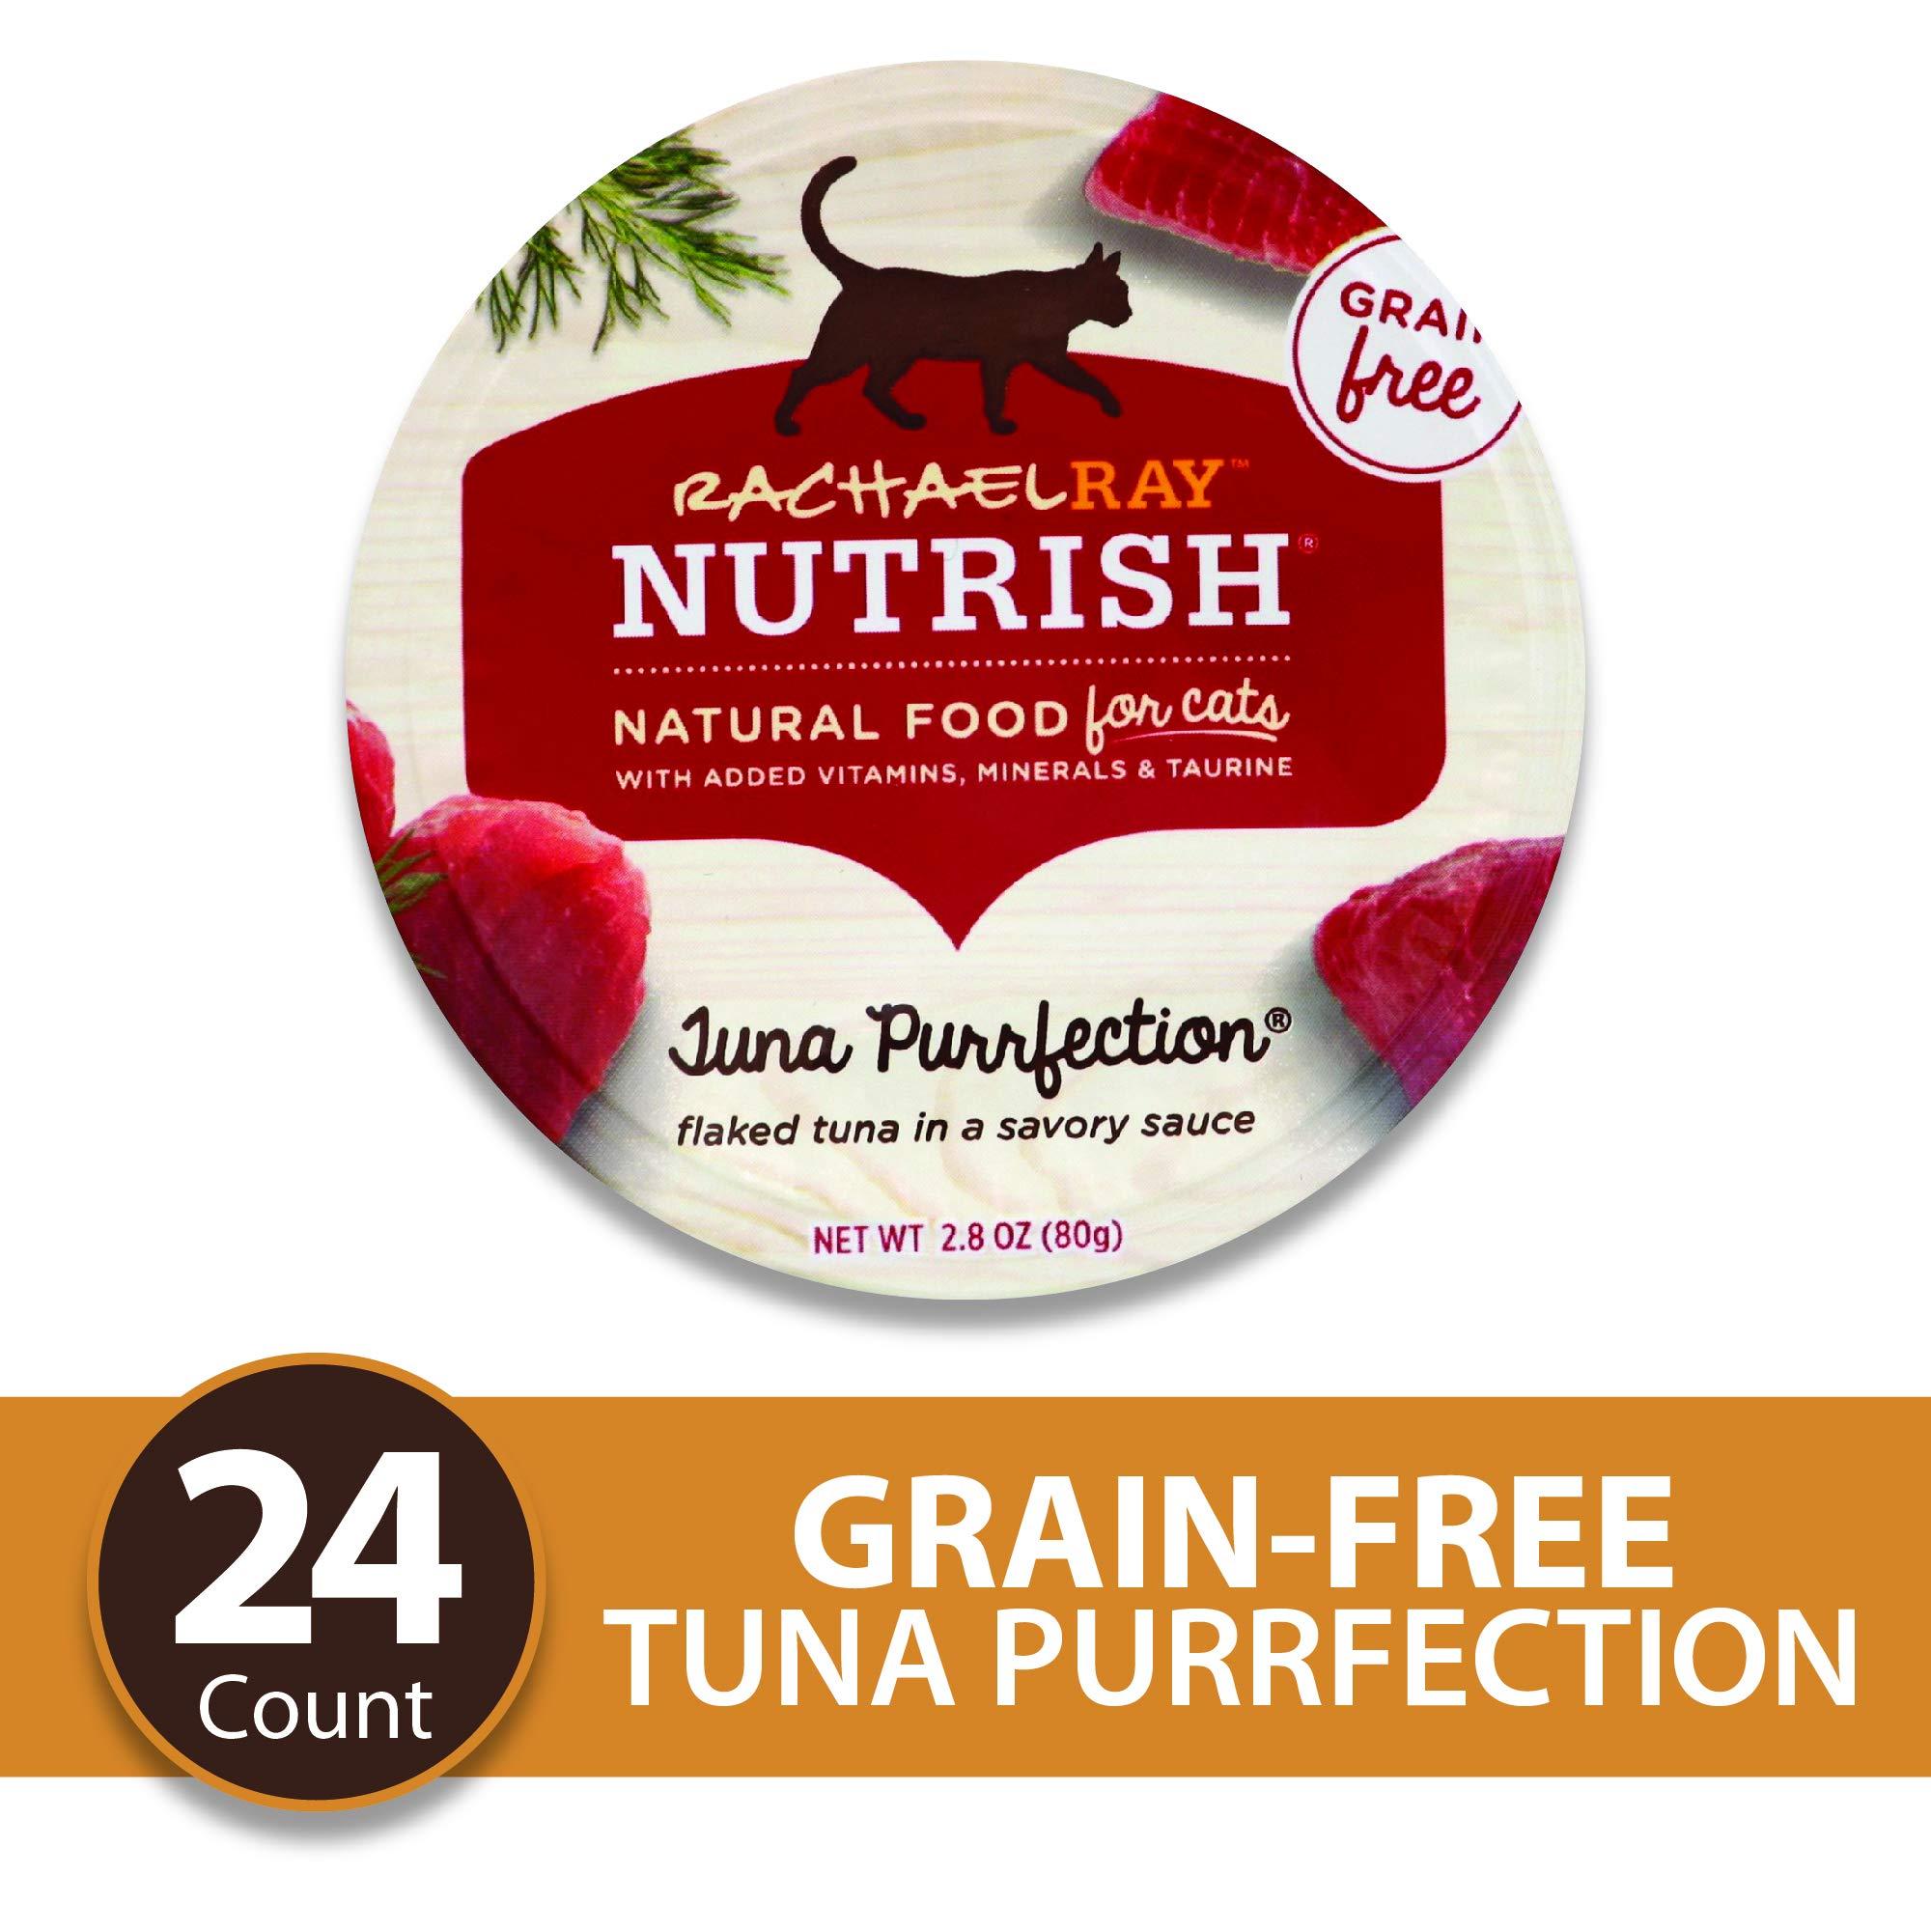 Rachael Ray Nutrish Natural Premium Wet Cat Food, Tuna Purrfection, Grain Free, 2.8 Oz. Tub (Pack Of 24) by Rachael Ray Nutrish